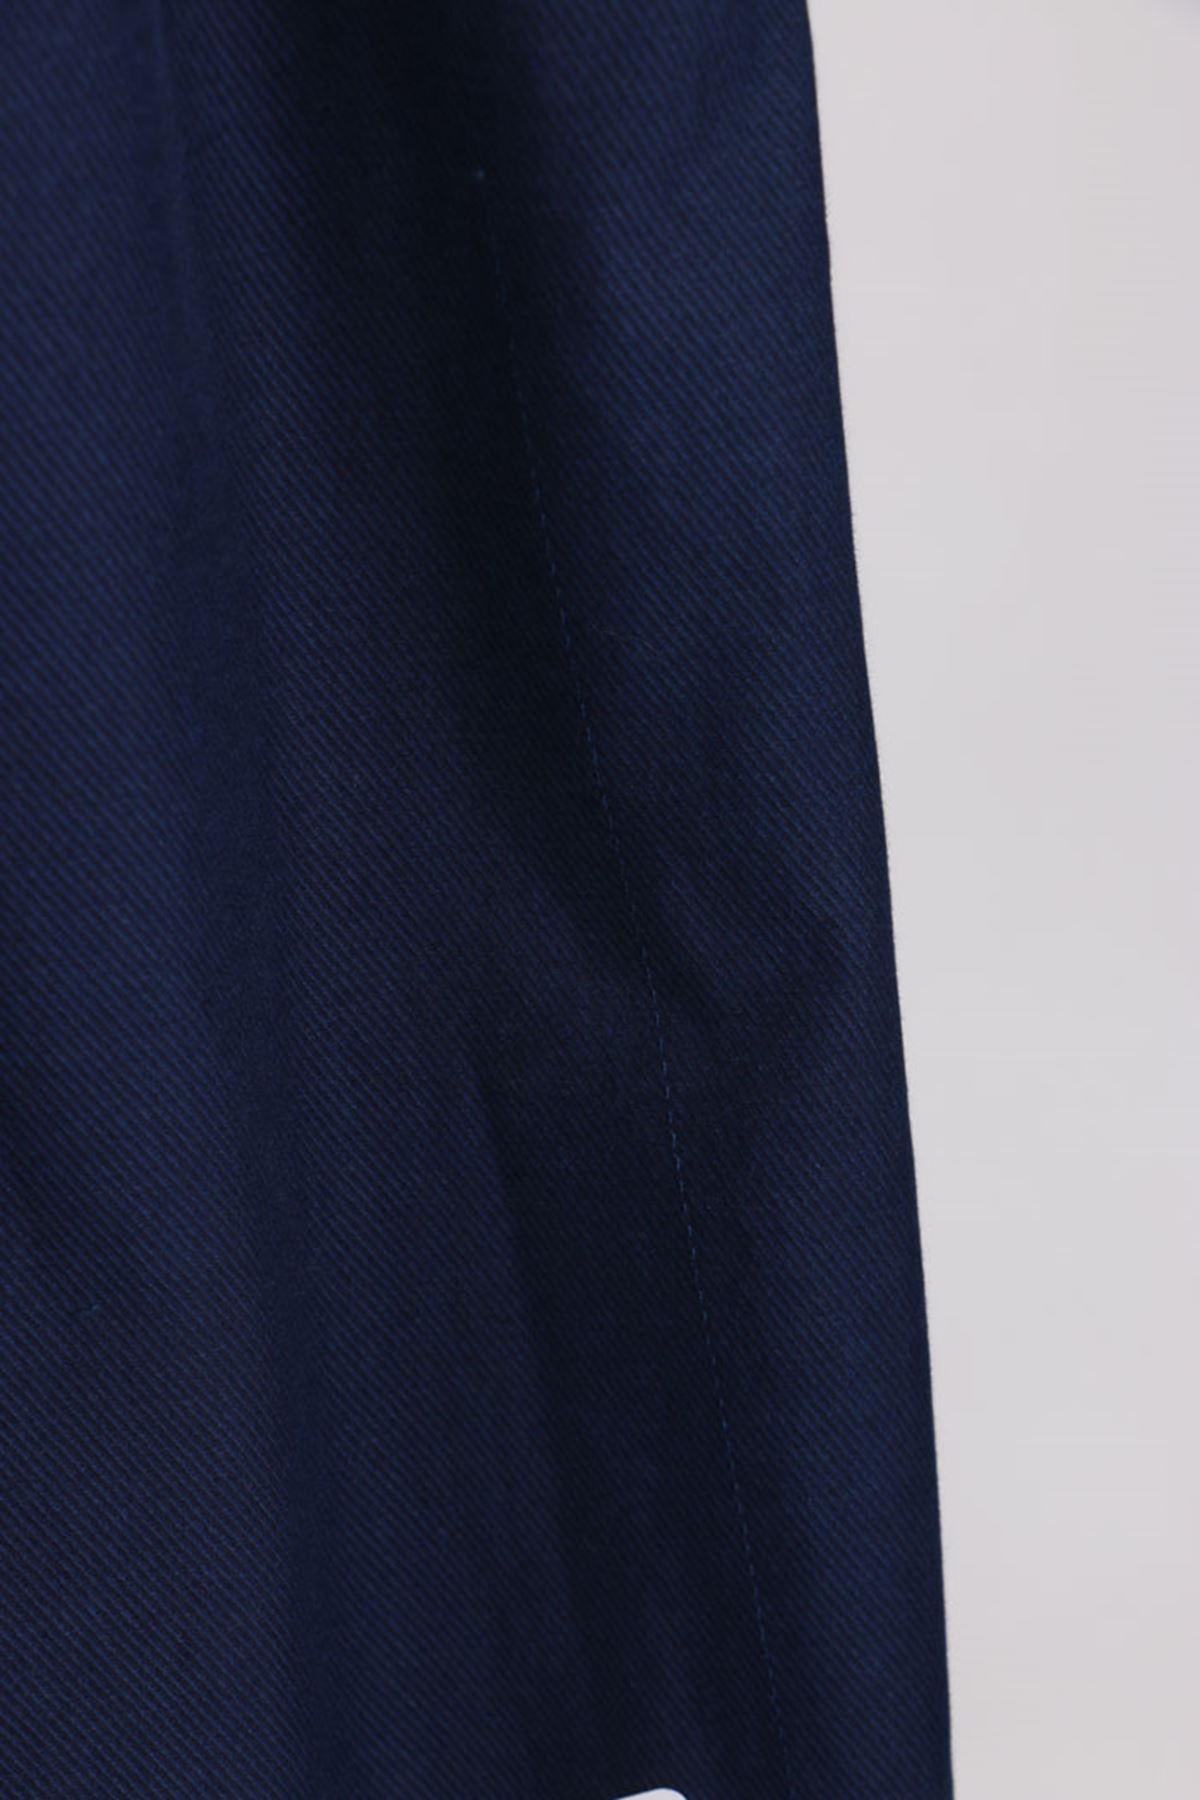 D-9124 Büyük Beden Defolu Beli Lastikli Bol Paça Kot Pantolon-Lacivert